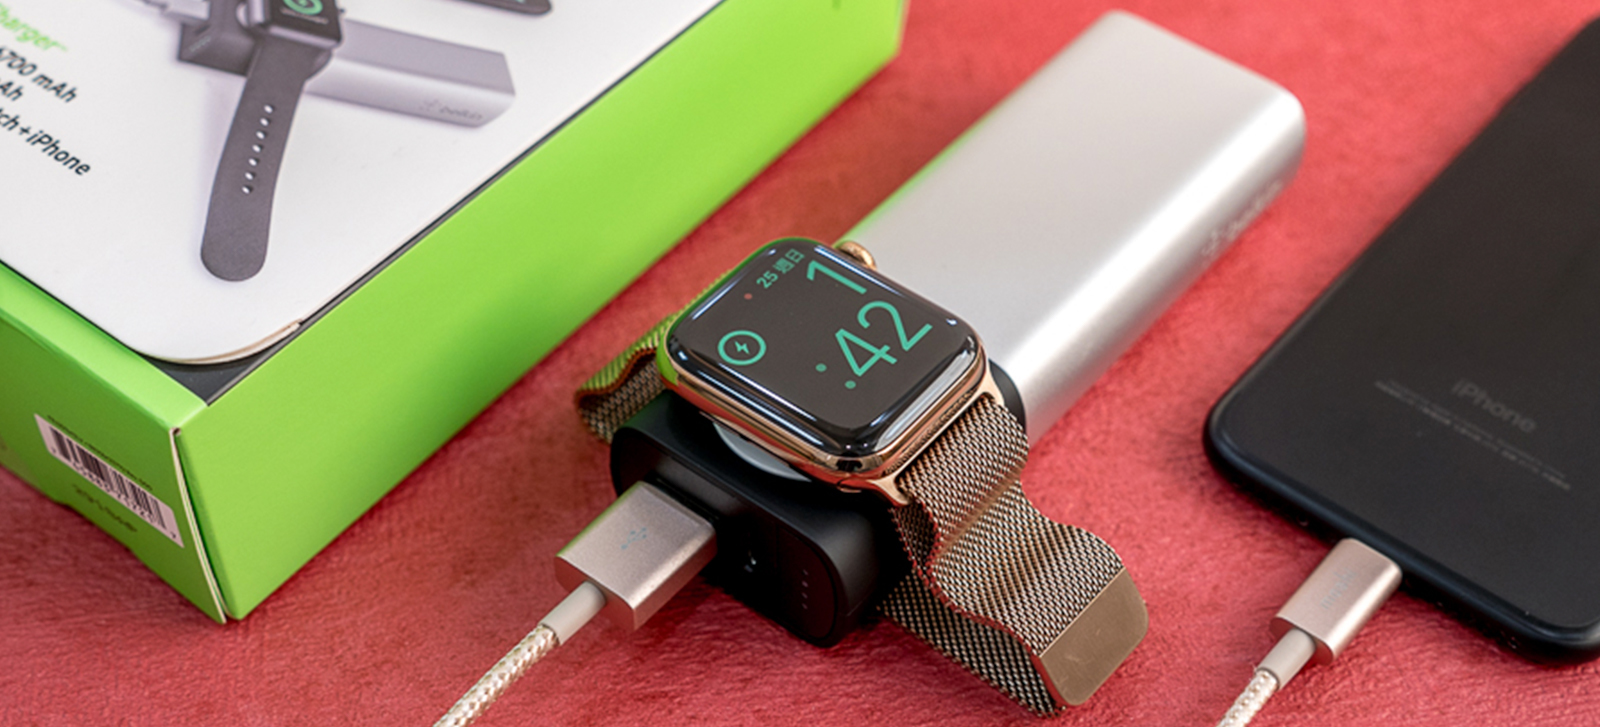 Belkin Valet Charger Apple Watch+iPhone 二合一行動電源(6700mah)